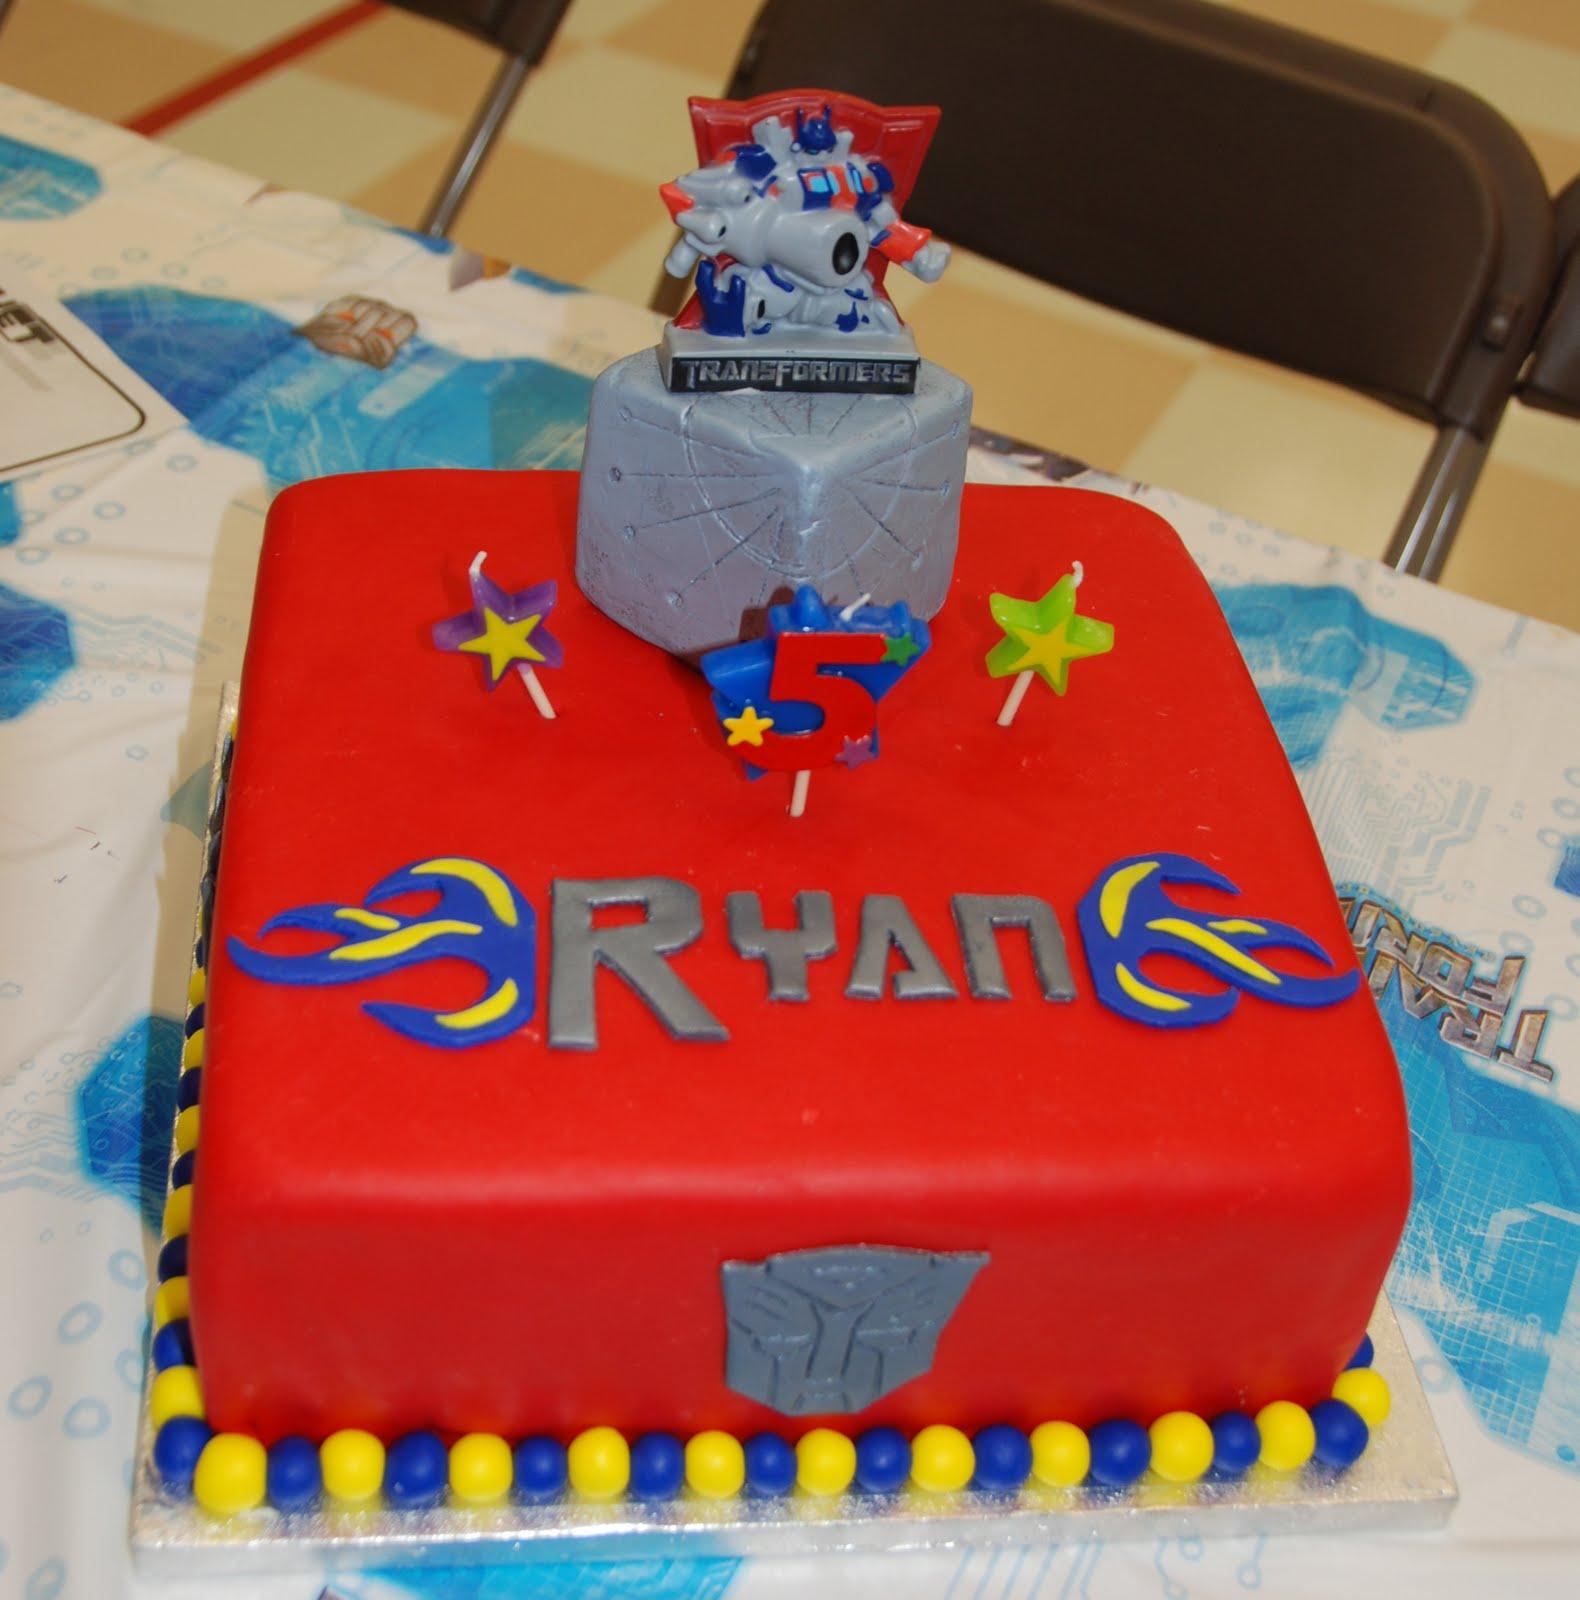 Cake Creations By Trish Transformers Birthday Cake